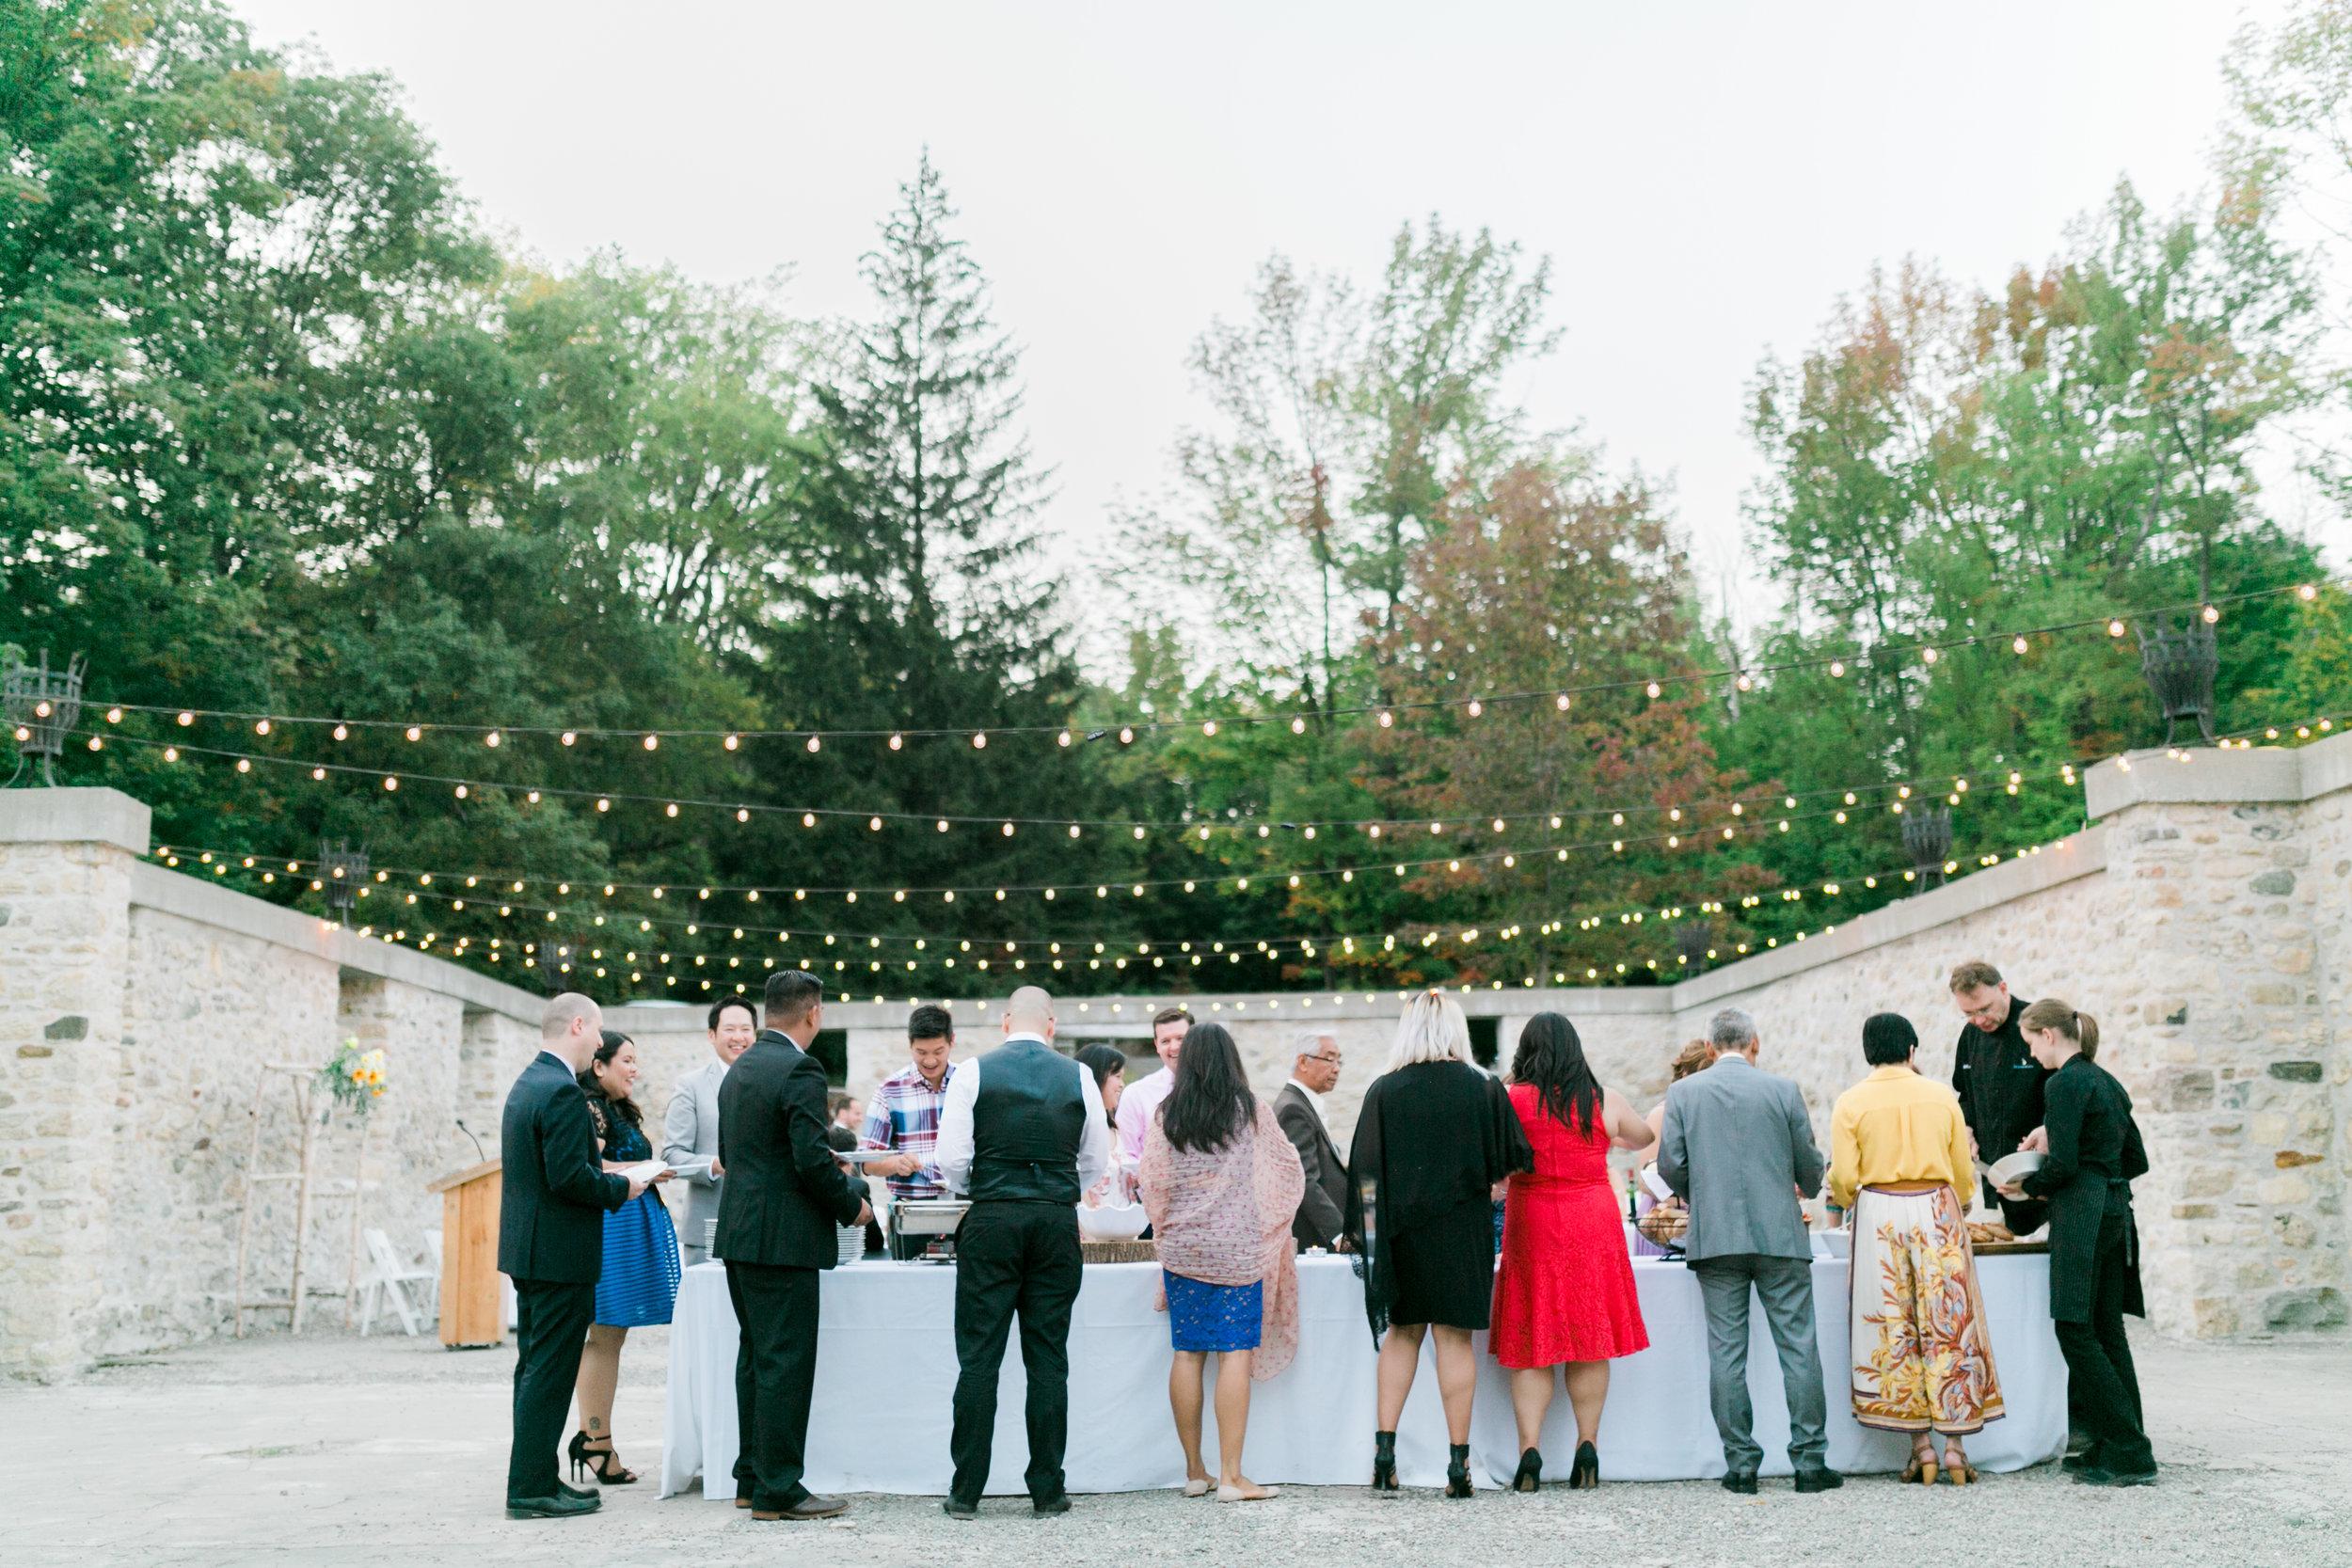 Alton Mills Wedding - Reception-90.jpg